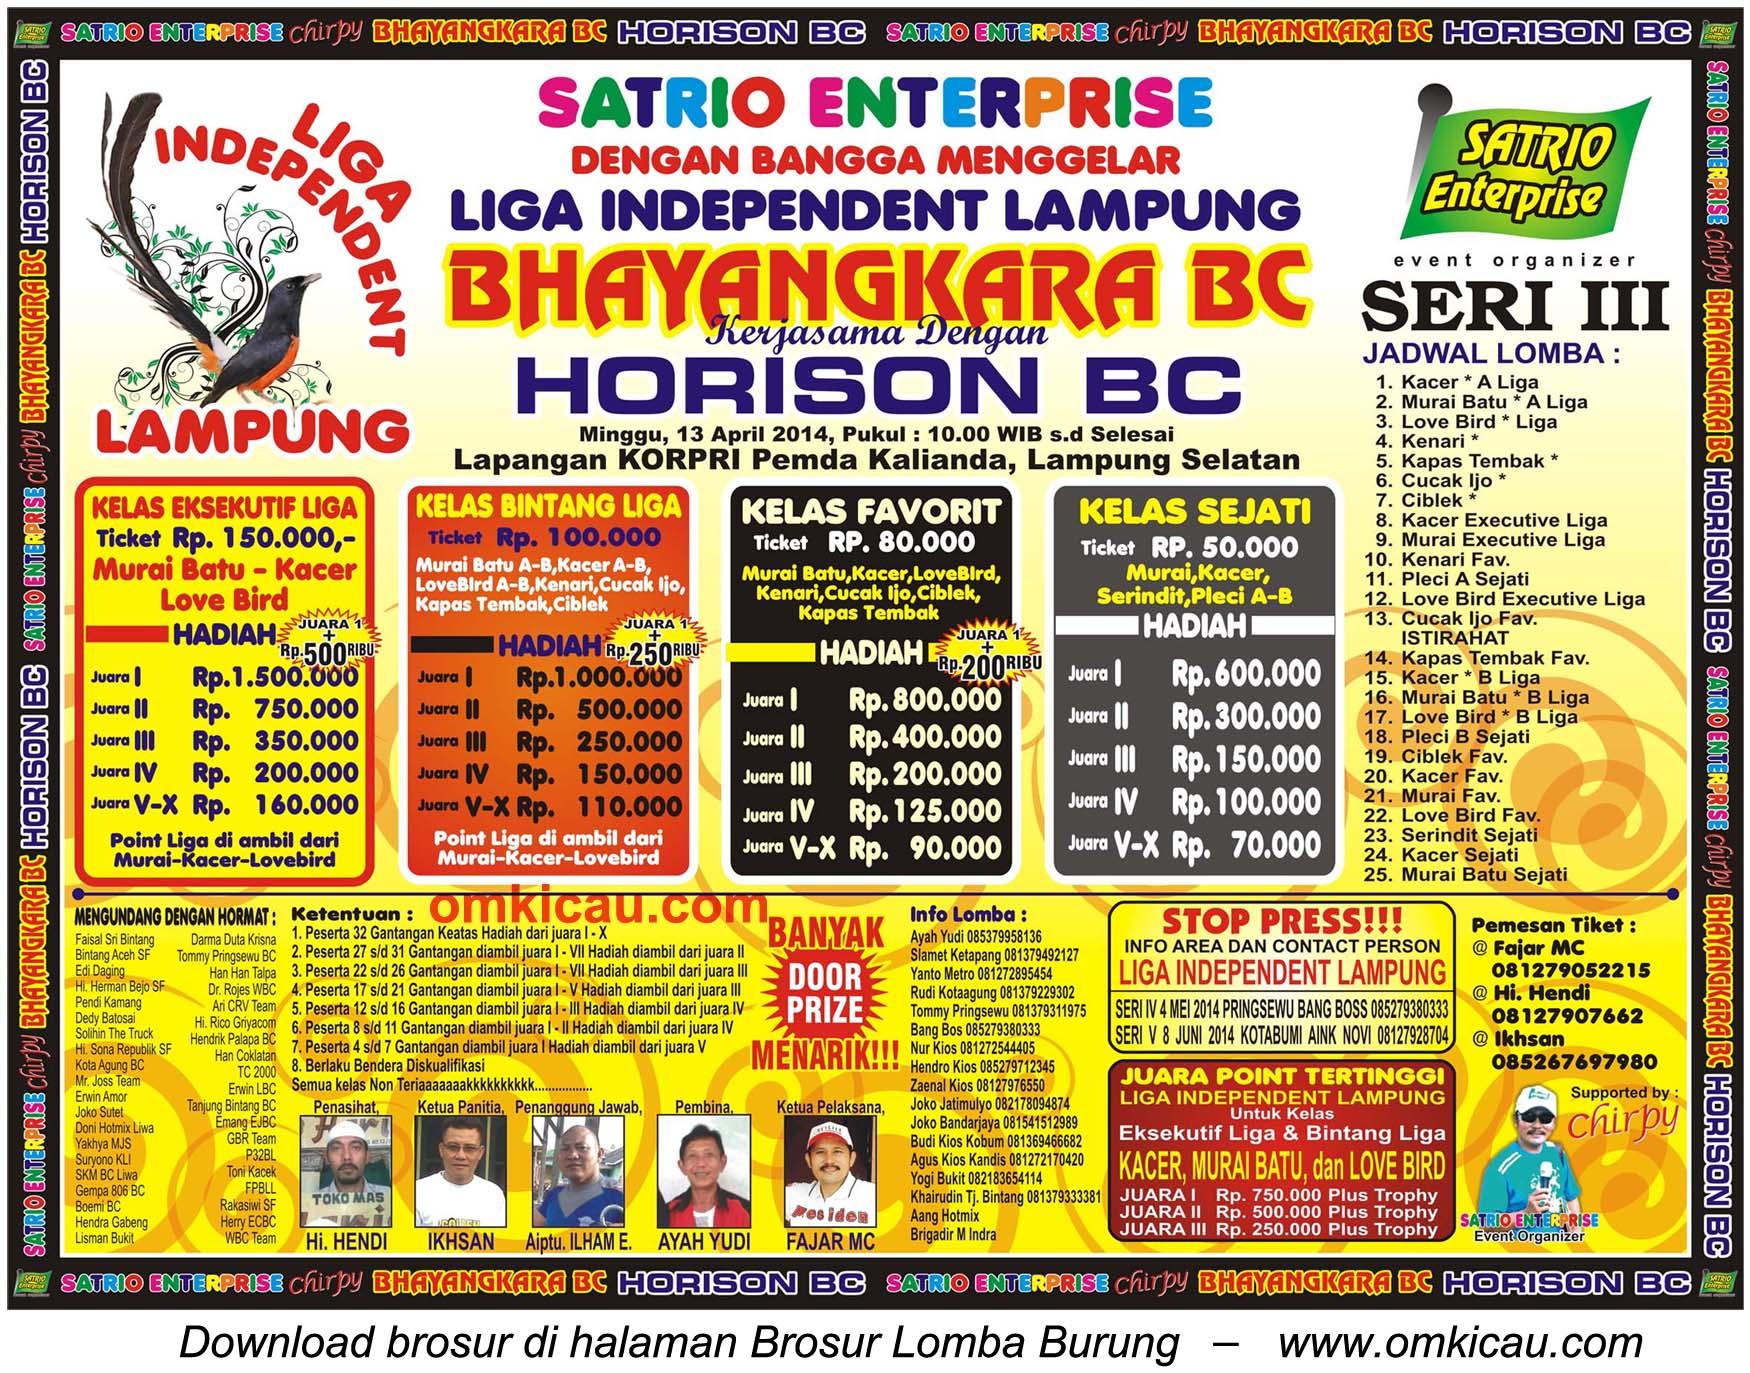 Brosur Lomba Burung Liga Independent Lampung Seri III, Lampung Selatan, 13 April 2014